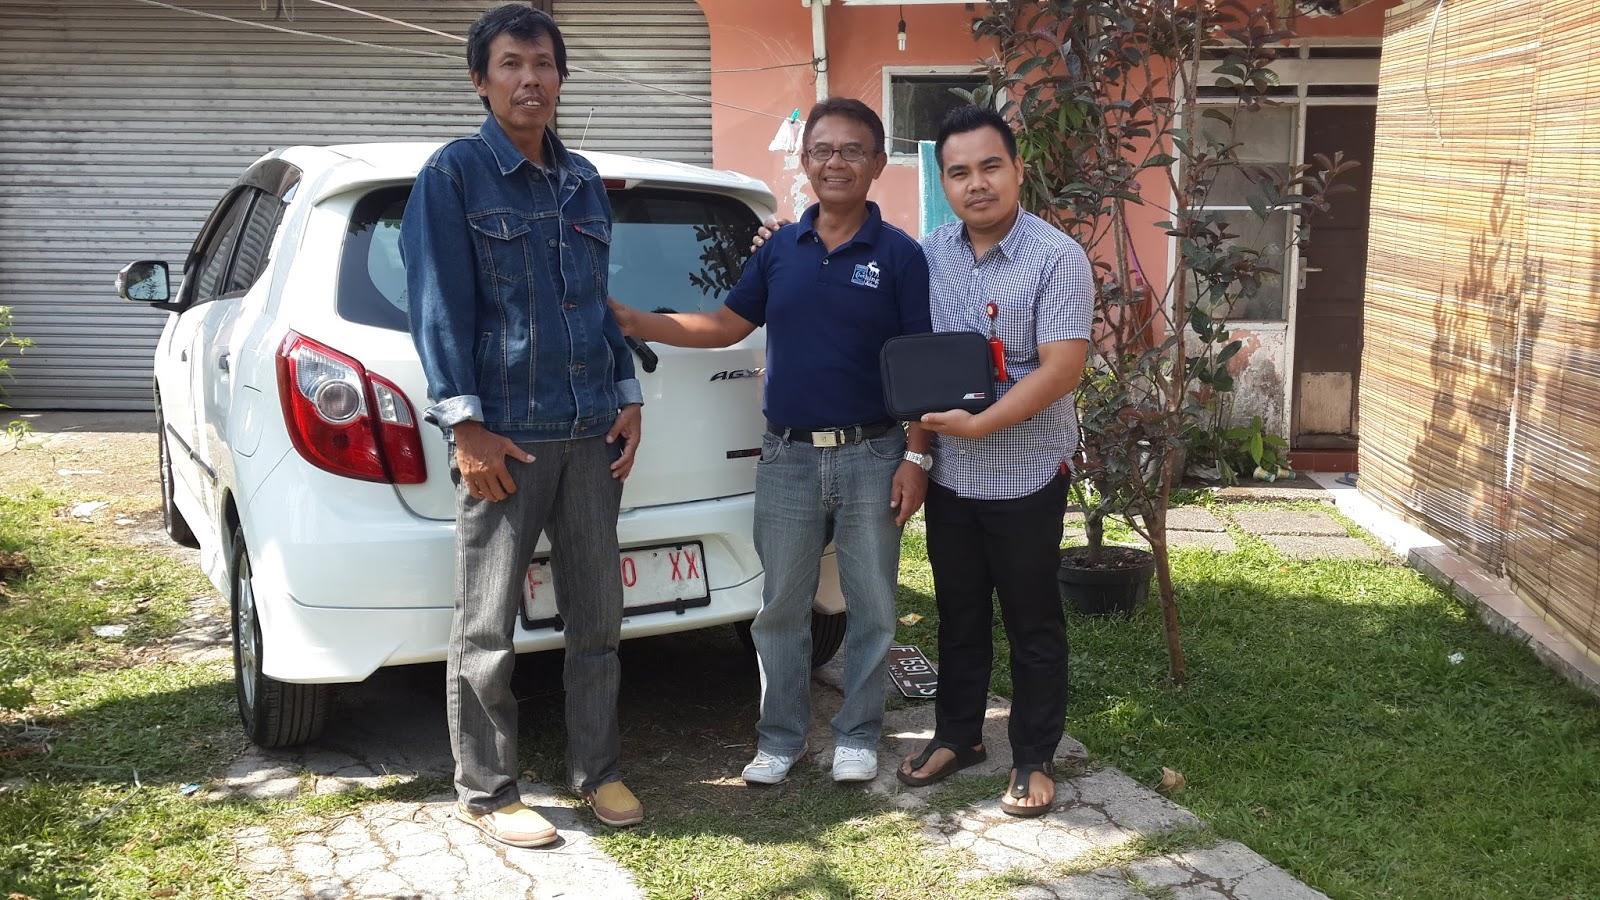 Cara Pengoperasian Audio All New Kijang Innova Cutting Sticker Grand Avanza Toyota Bogor Auto2000 Yasmin Oktober 2015